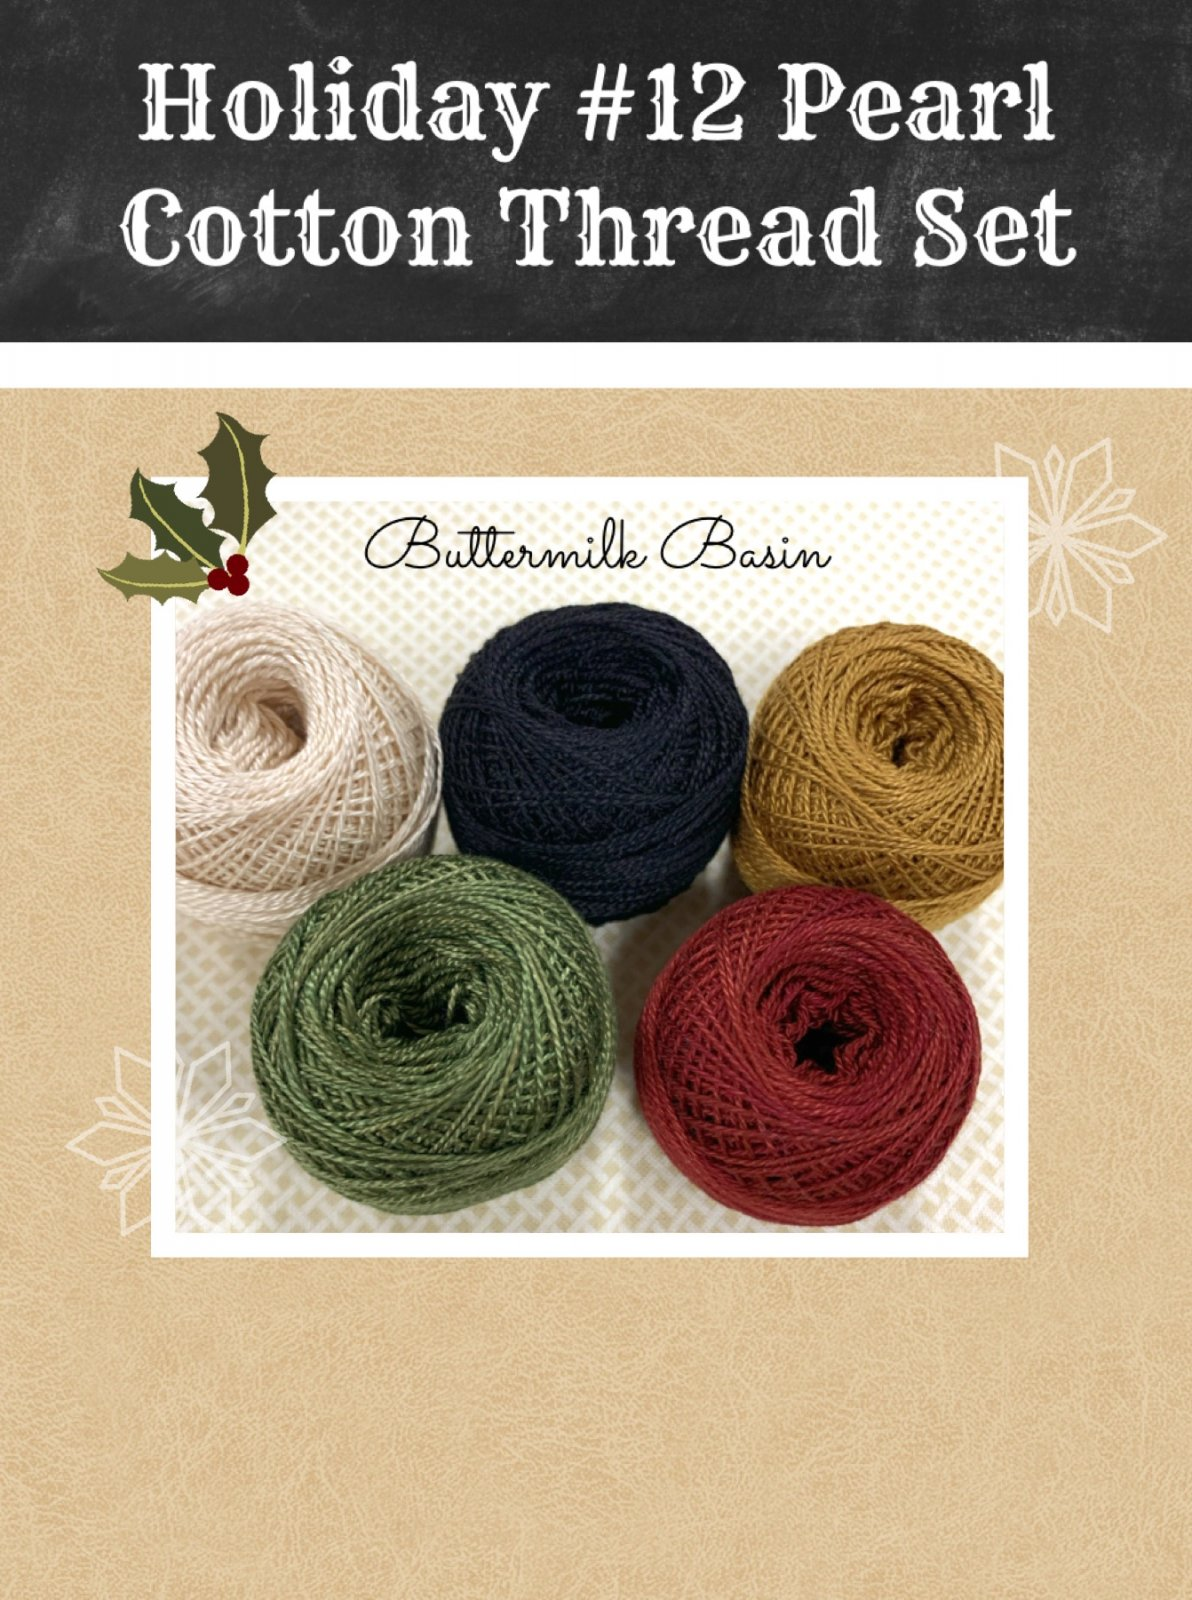 Holiday #12 Pearl Cotton Thread Set